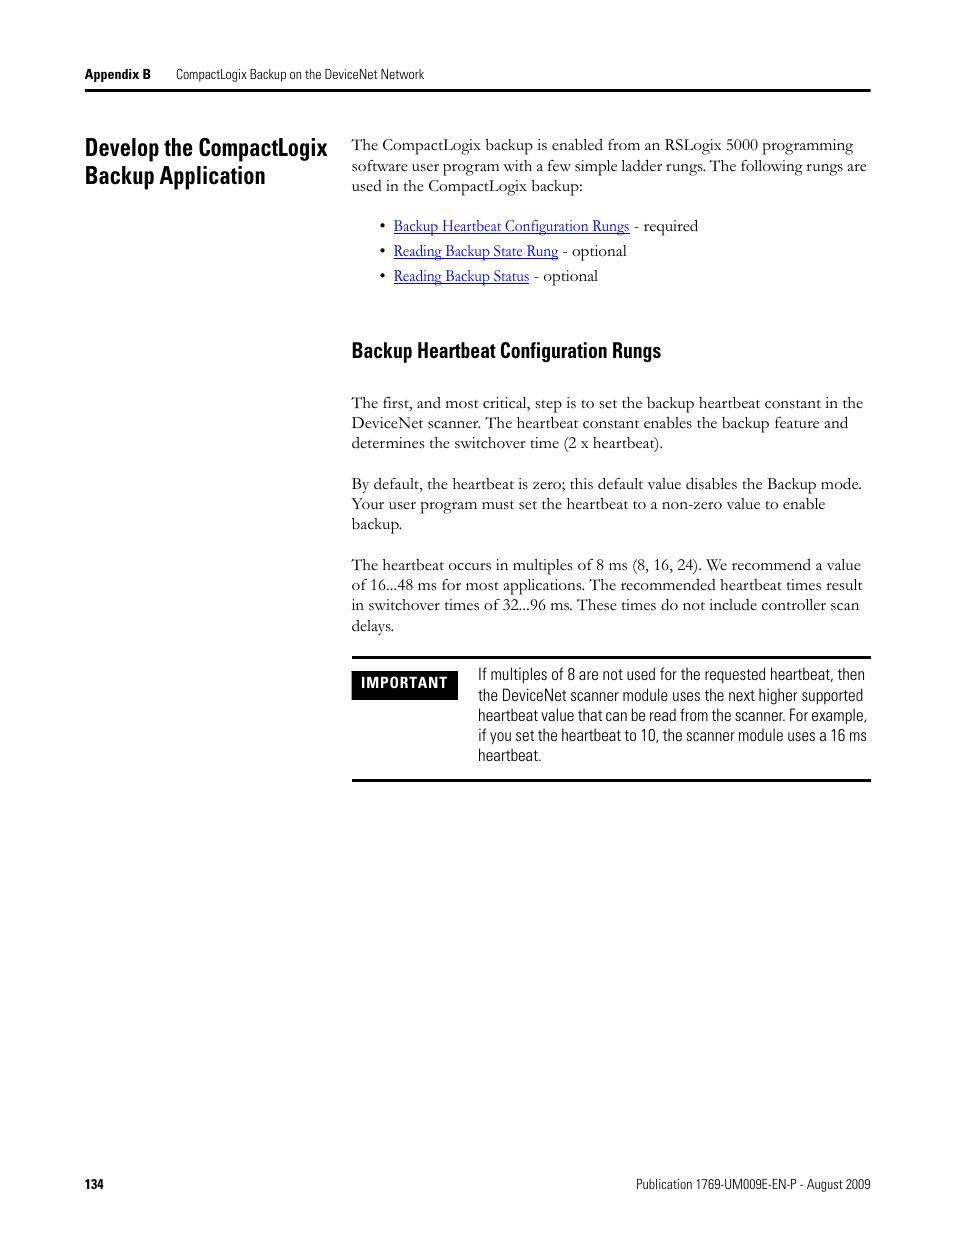 Develop the compactlogix backup application, Backup